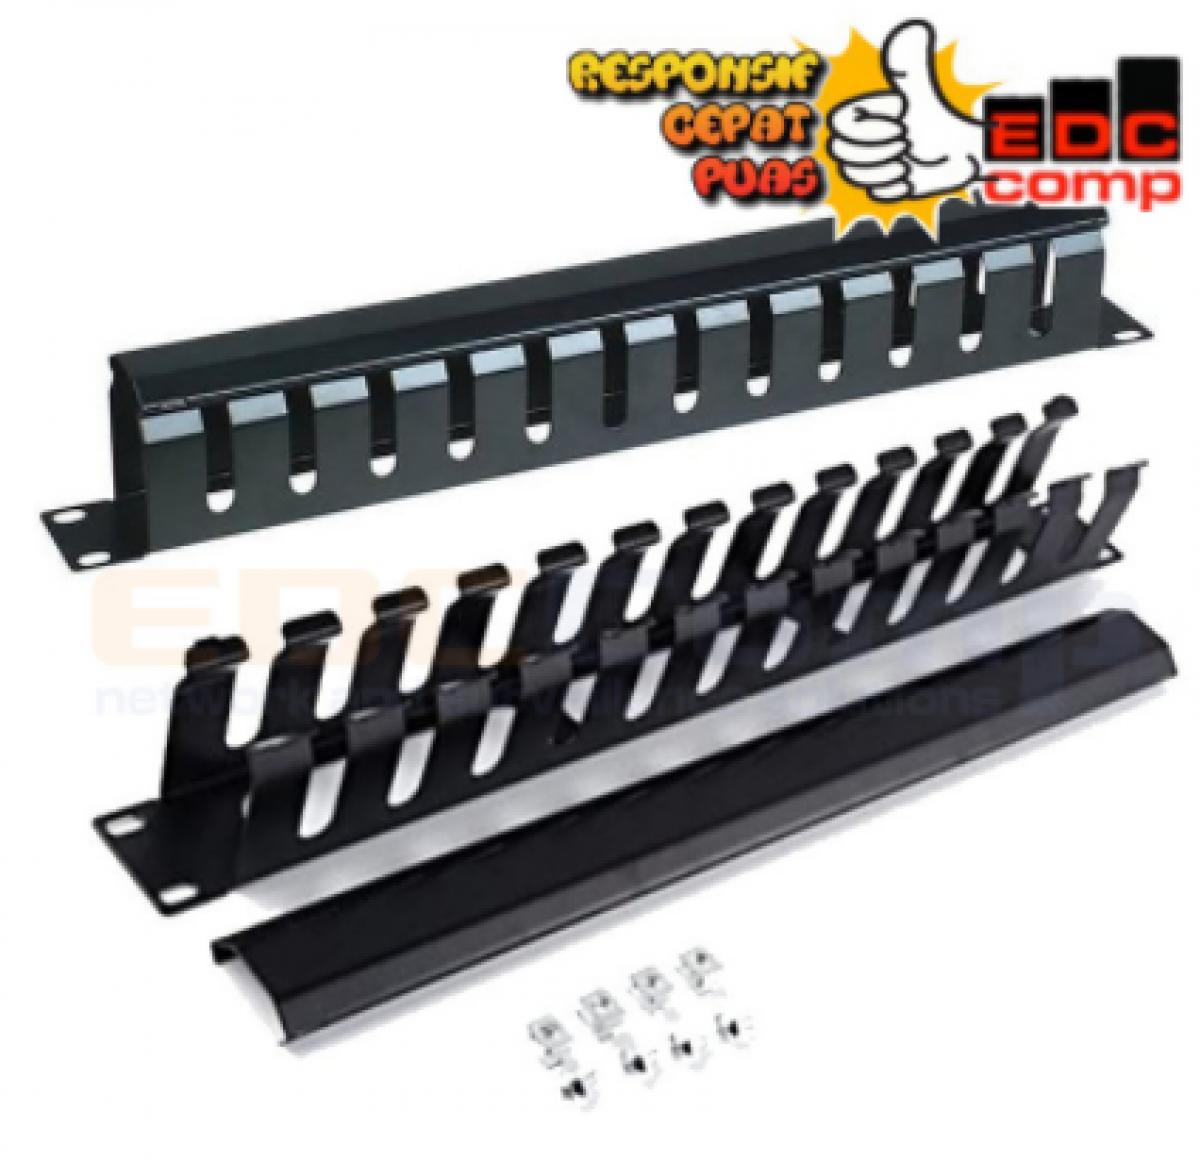 Wire Management rack 1U - EdcComp